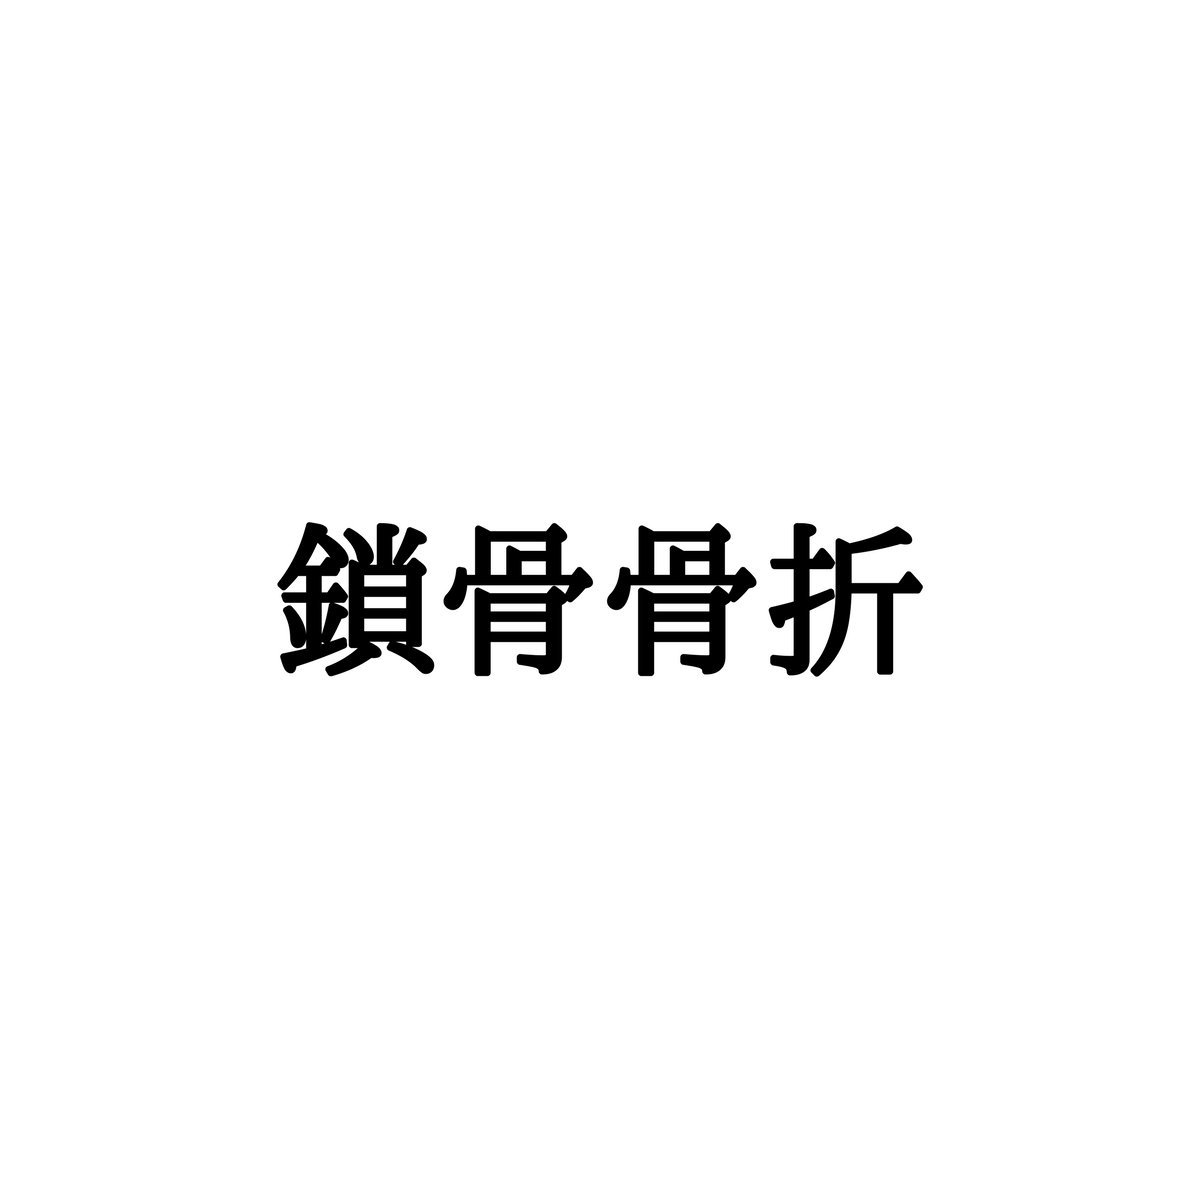 20180121111058